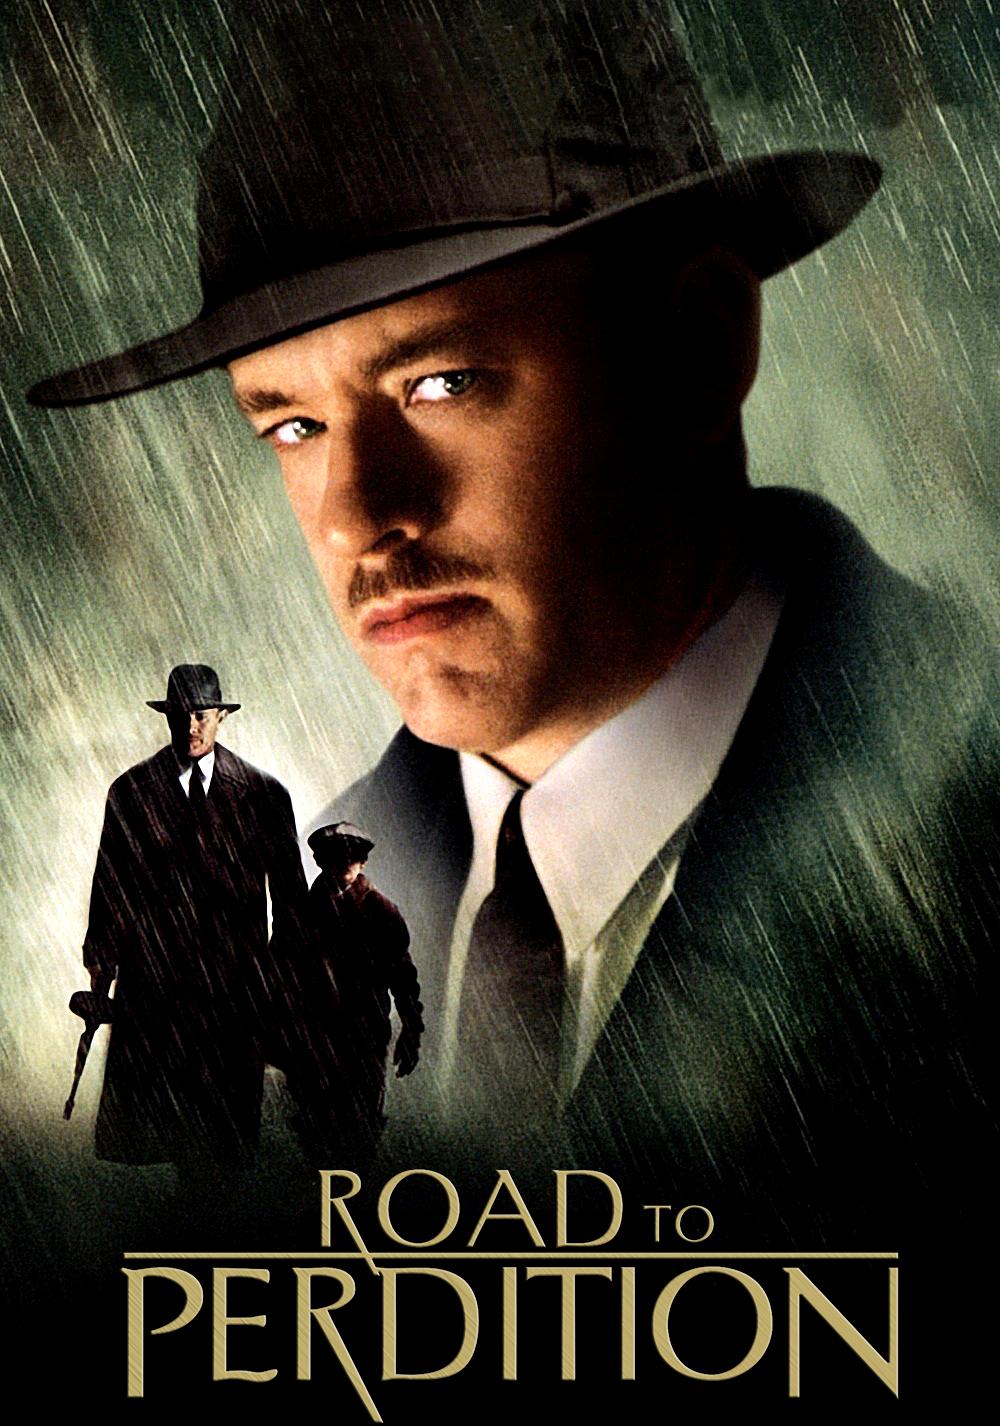 Road to Perdition | Movie fanart | fanart.tv